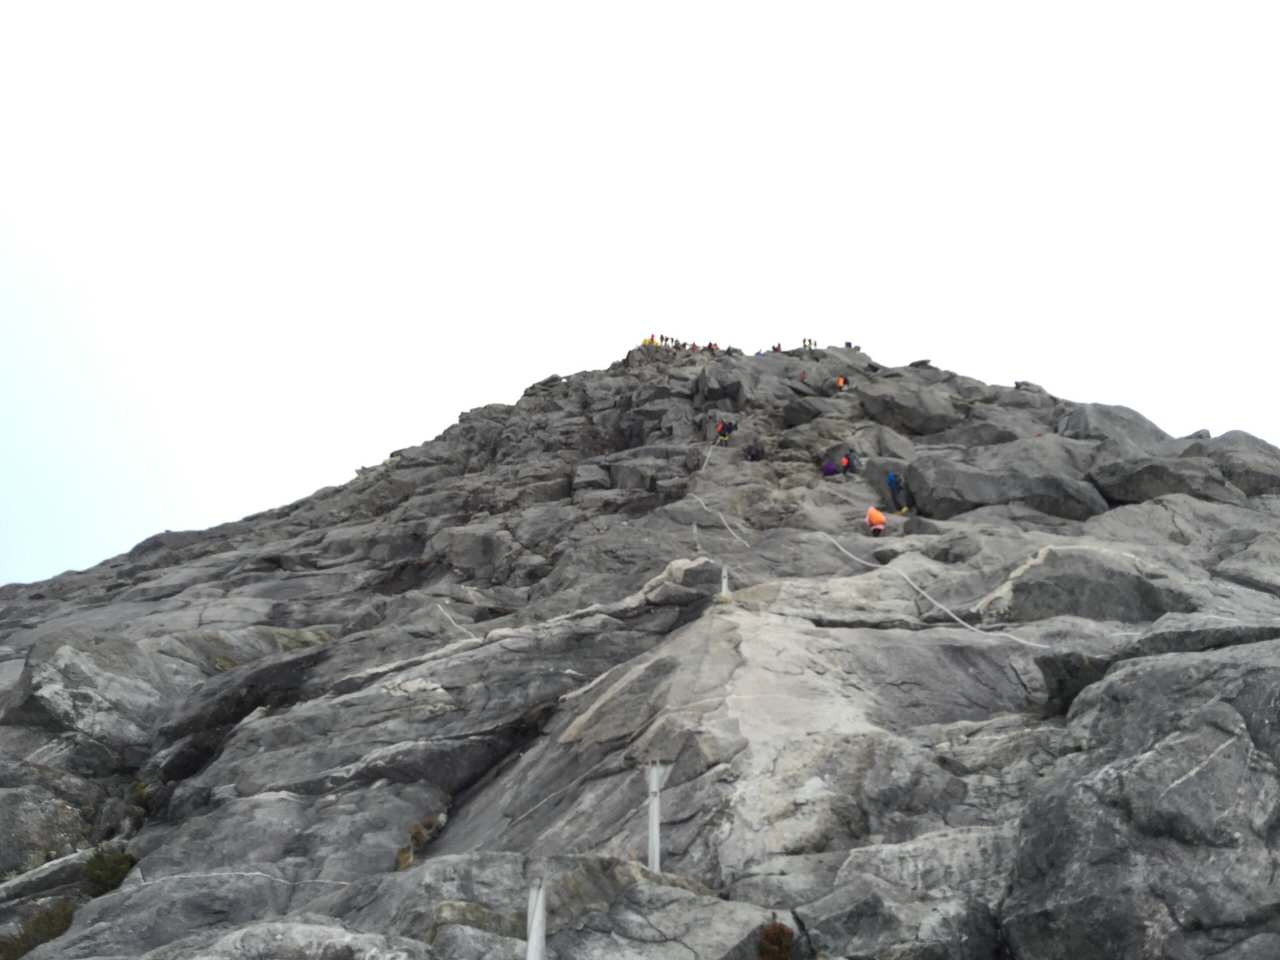 Kota Kinabalu climbing 4158